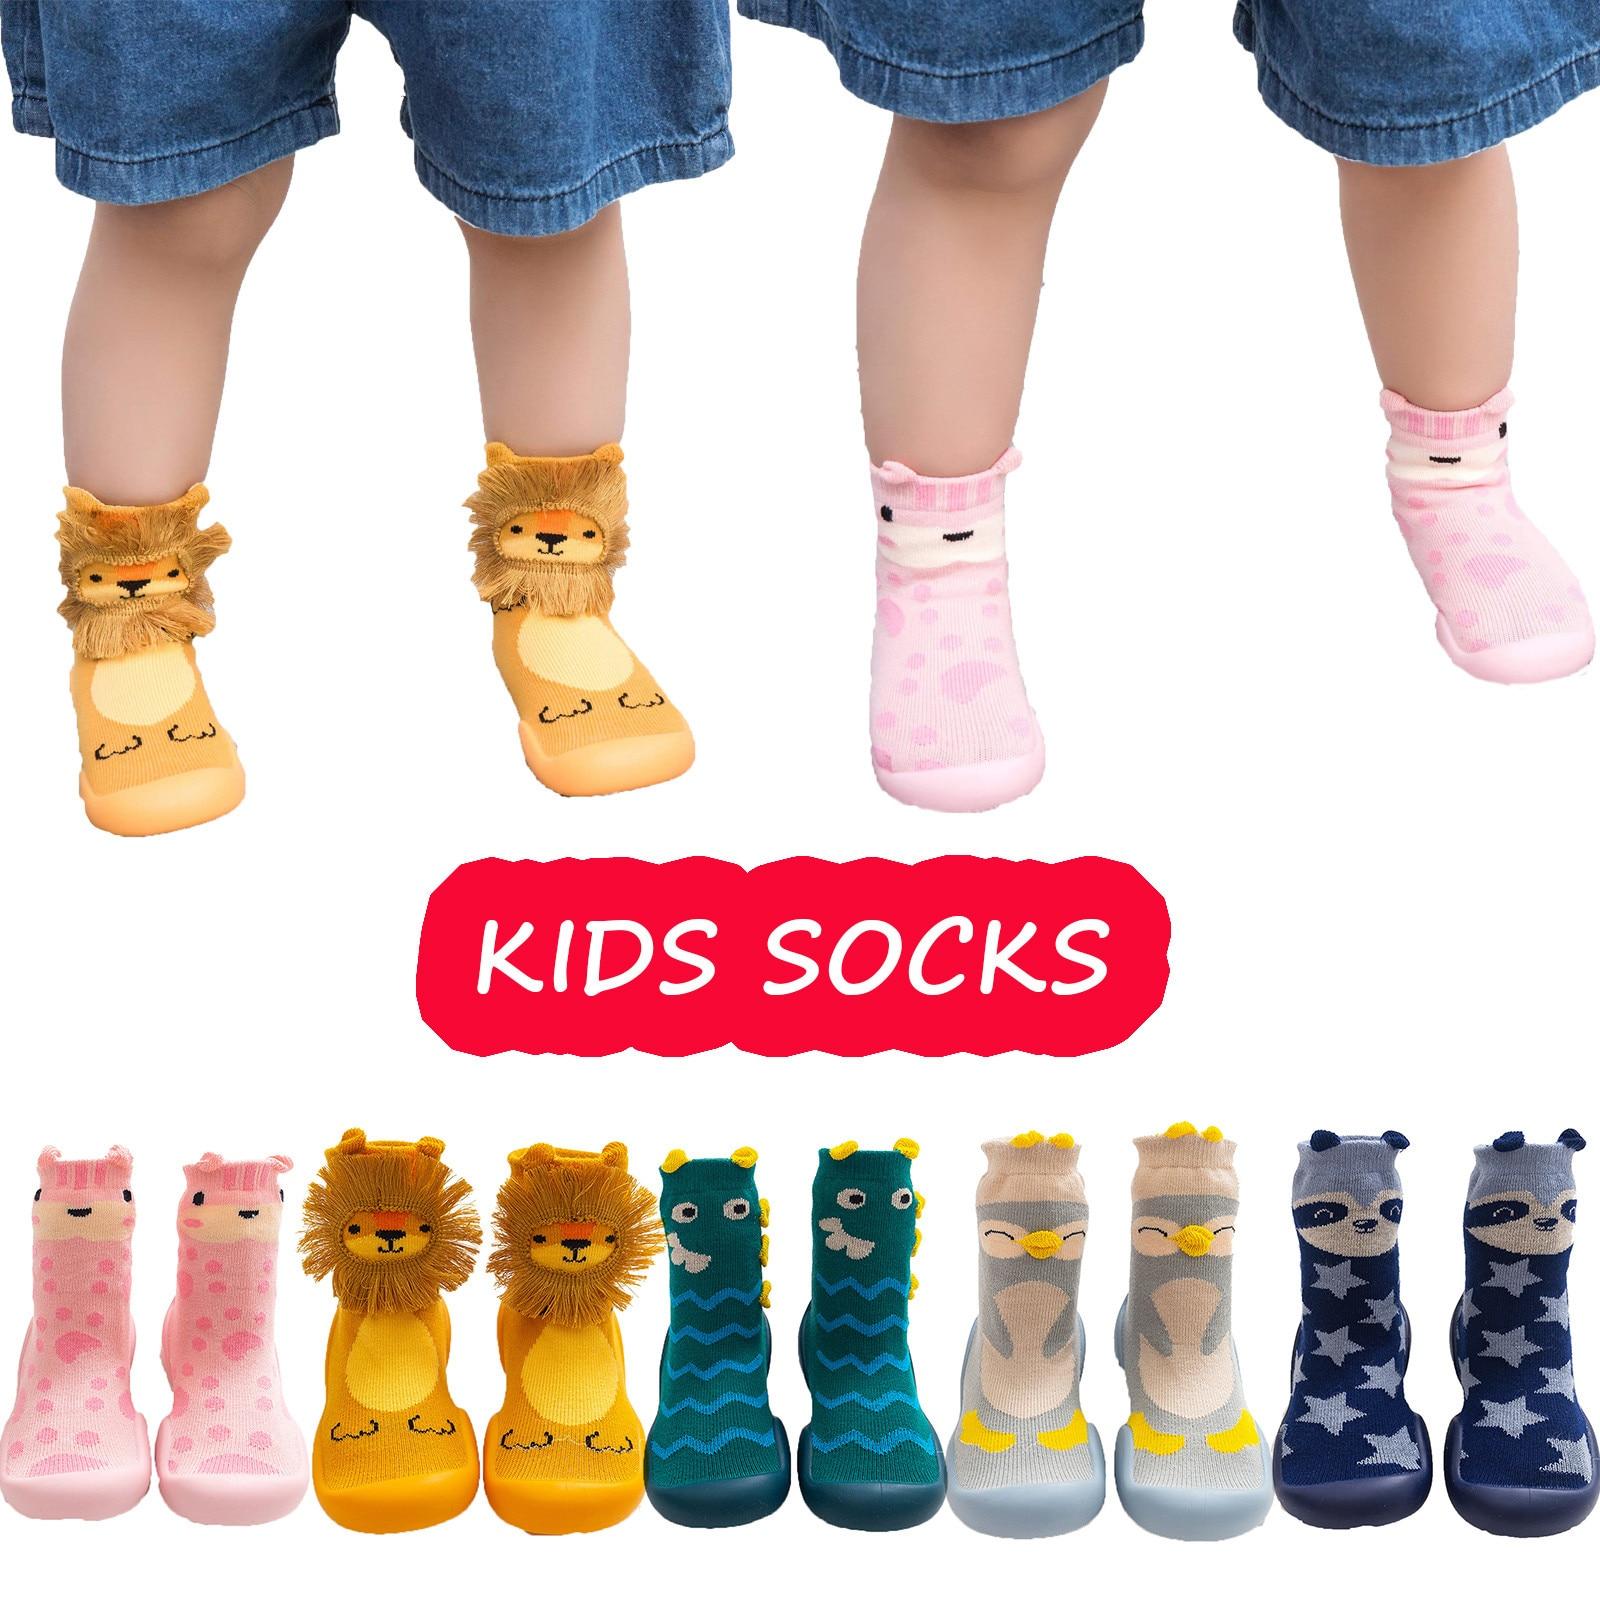 Toddler Kids Baby Knit Soft Sole Rubber Shoes Socks Slipper Stocking Kроссовки детски�